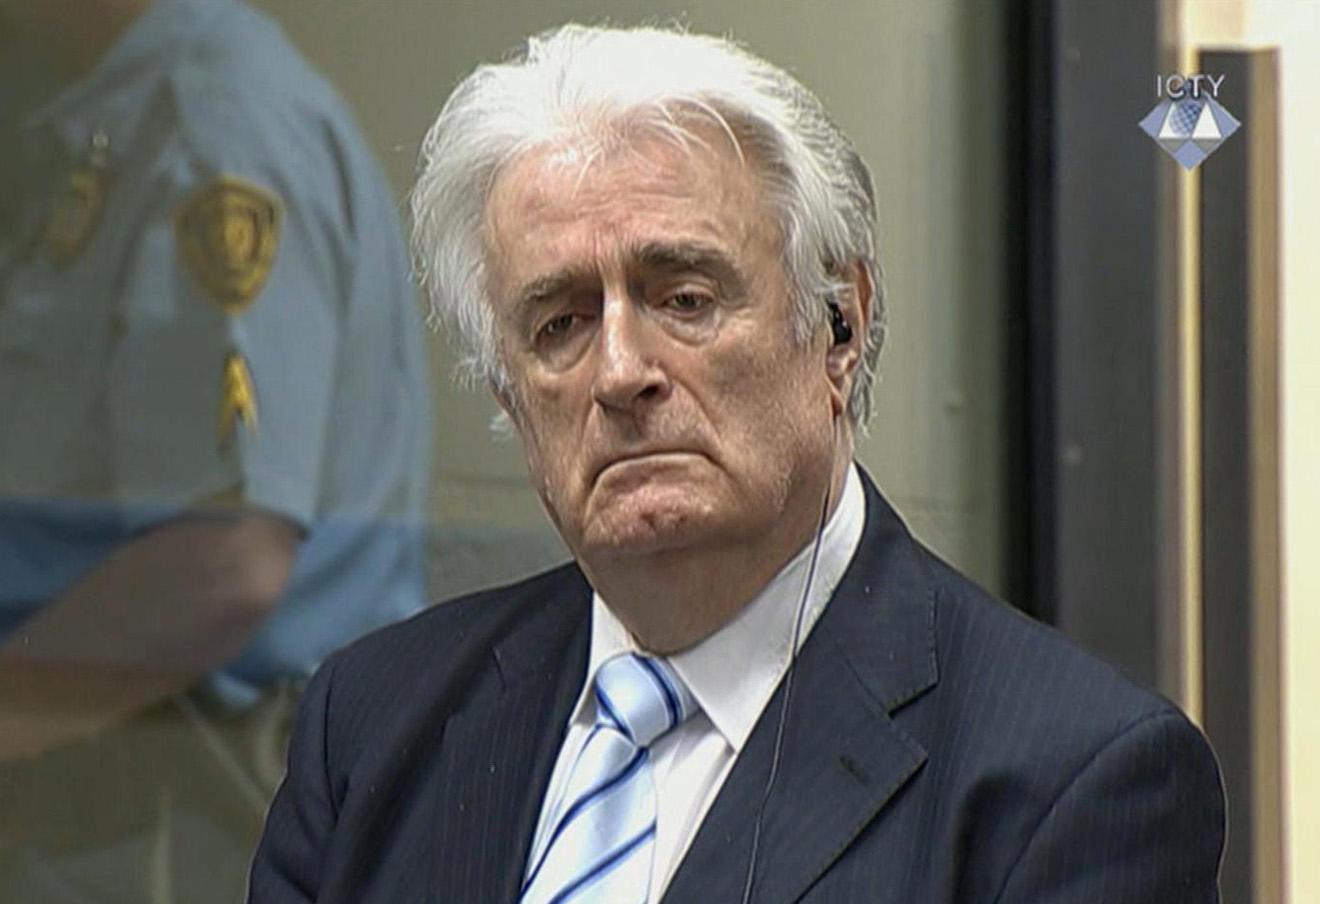 Радован Караджич слушает приговор 24 марта 2016 года.